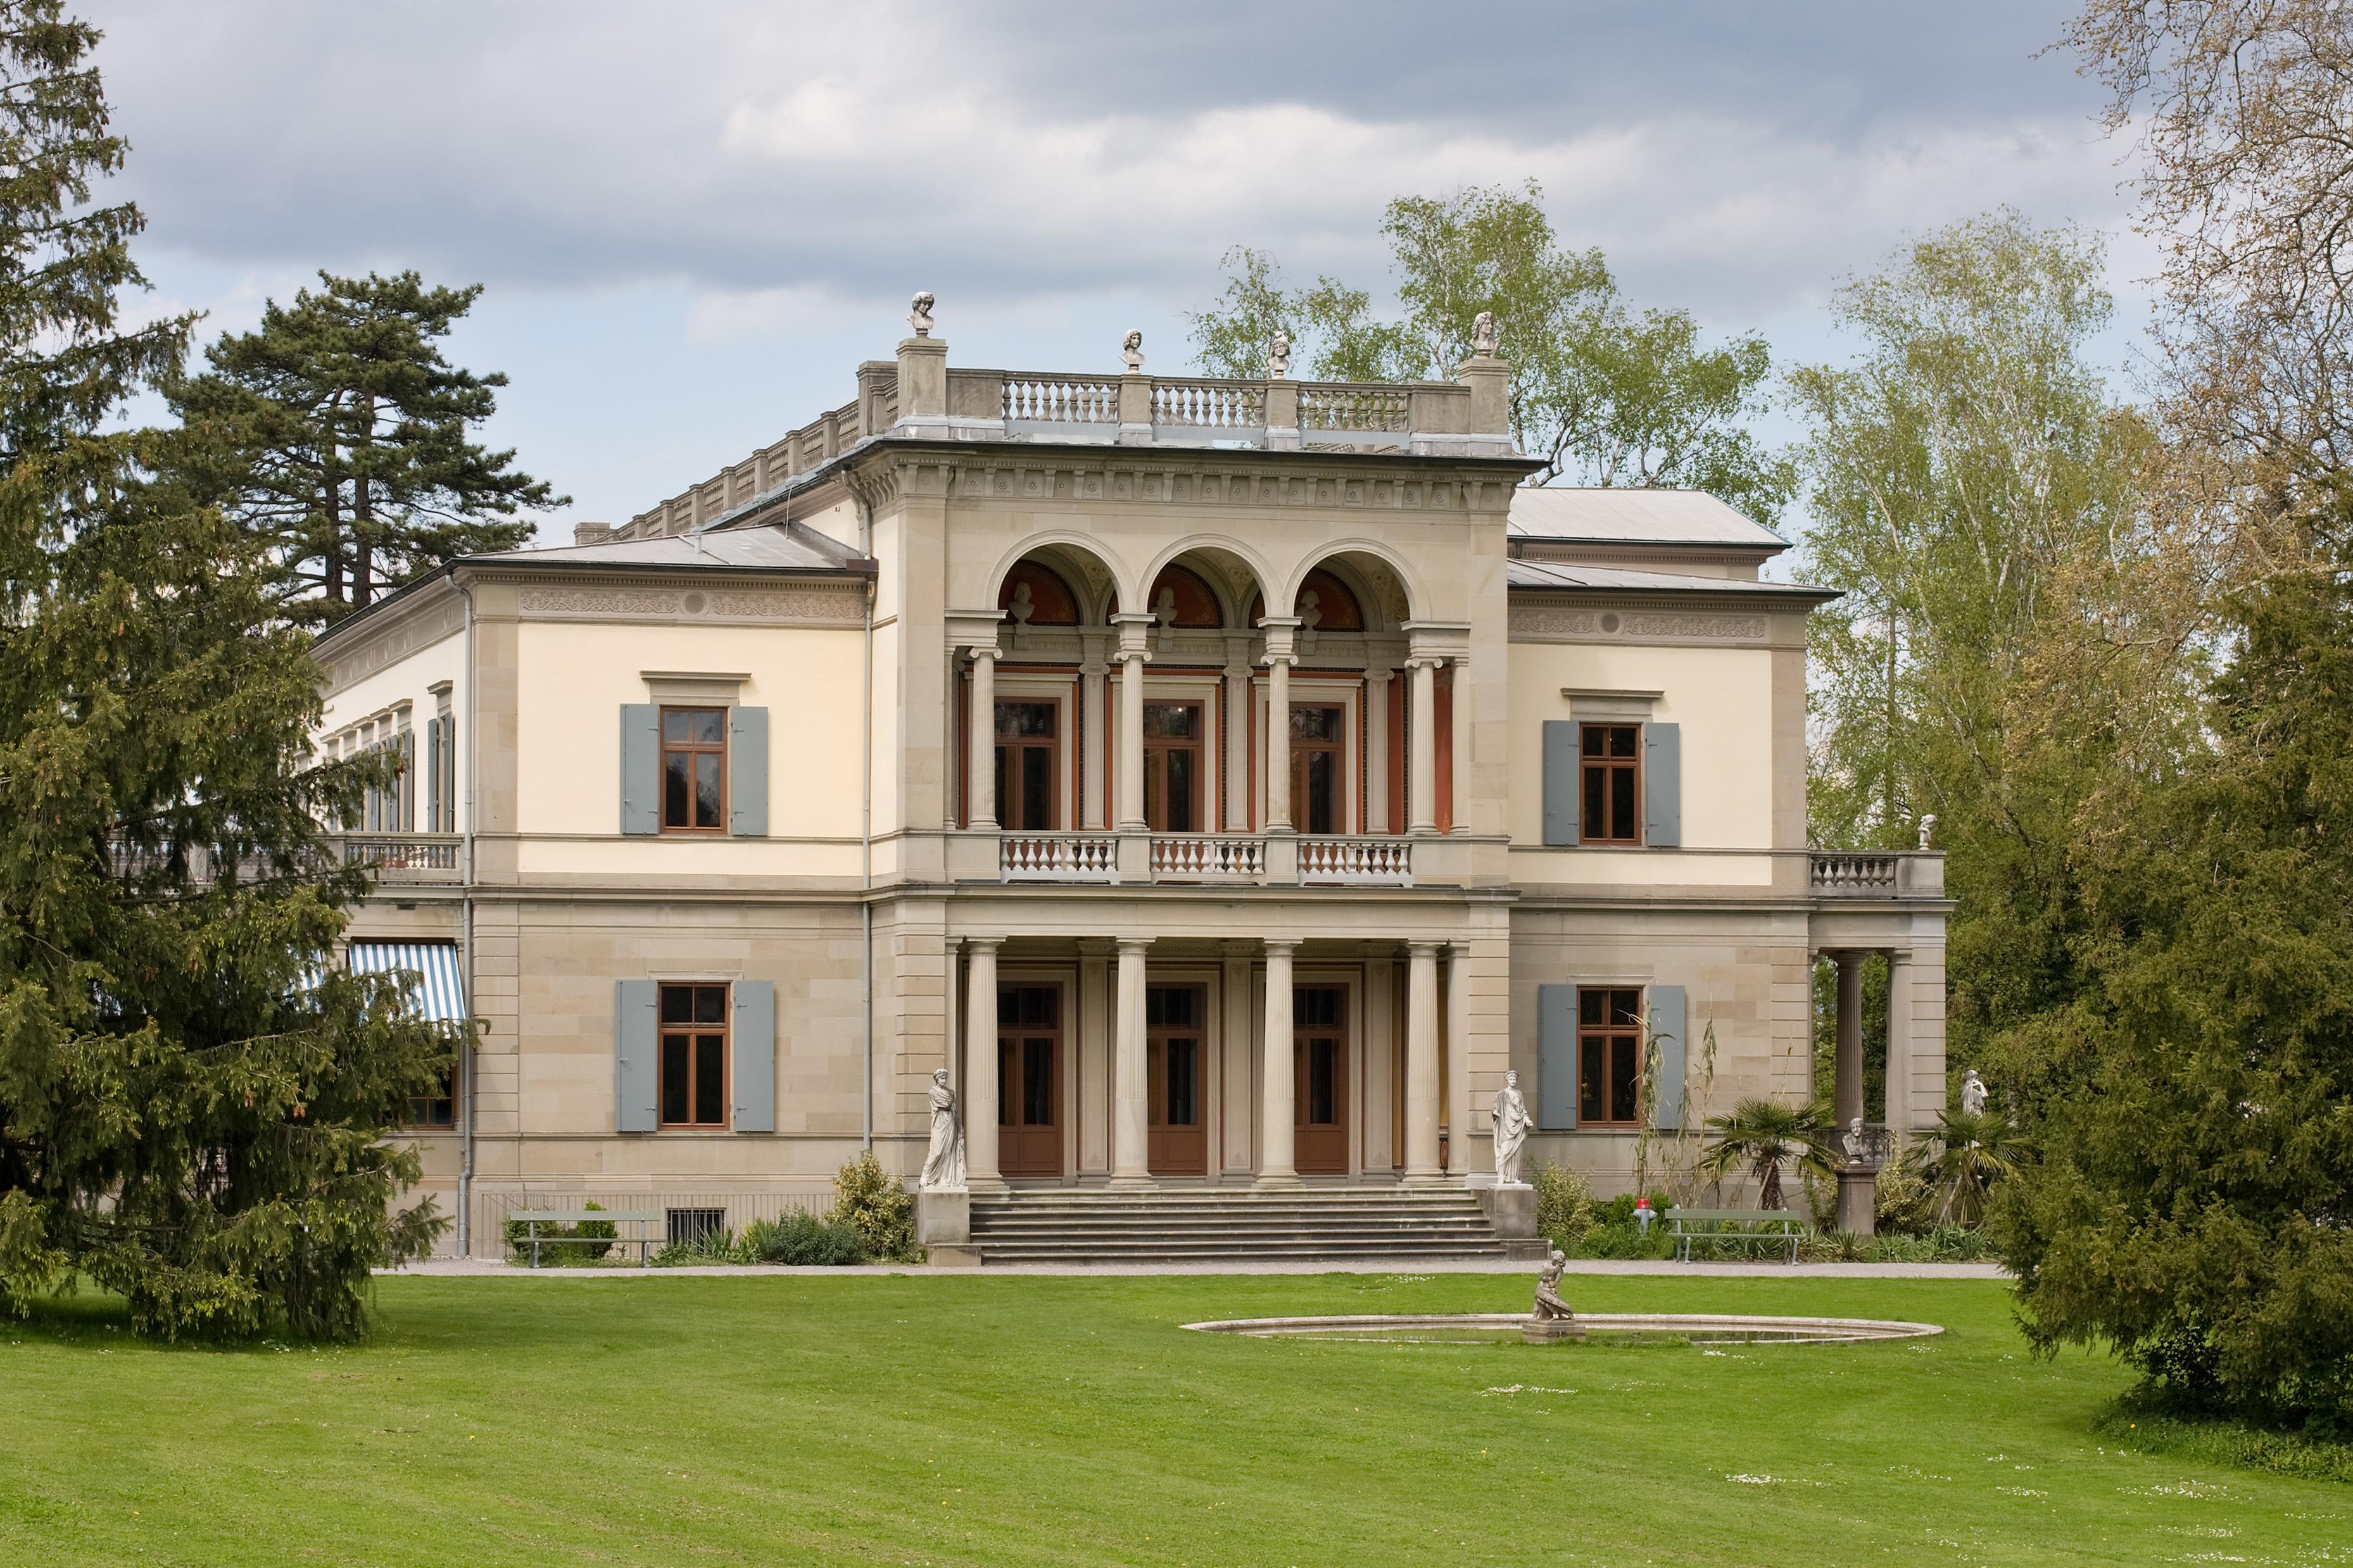 Design House Extension Free Software File Zuerich Villa Wesendonck Jpg Wikimedia Commons